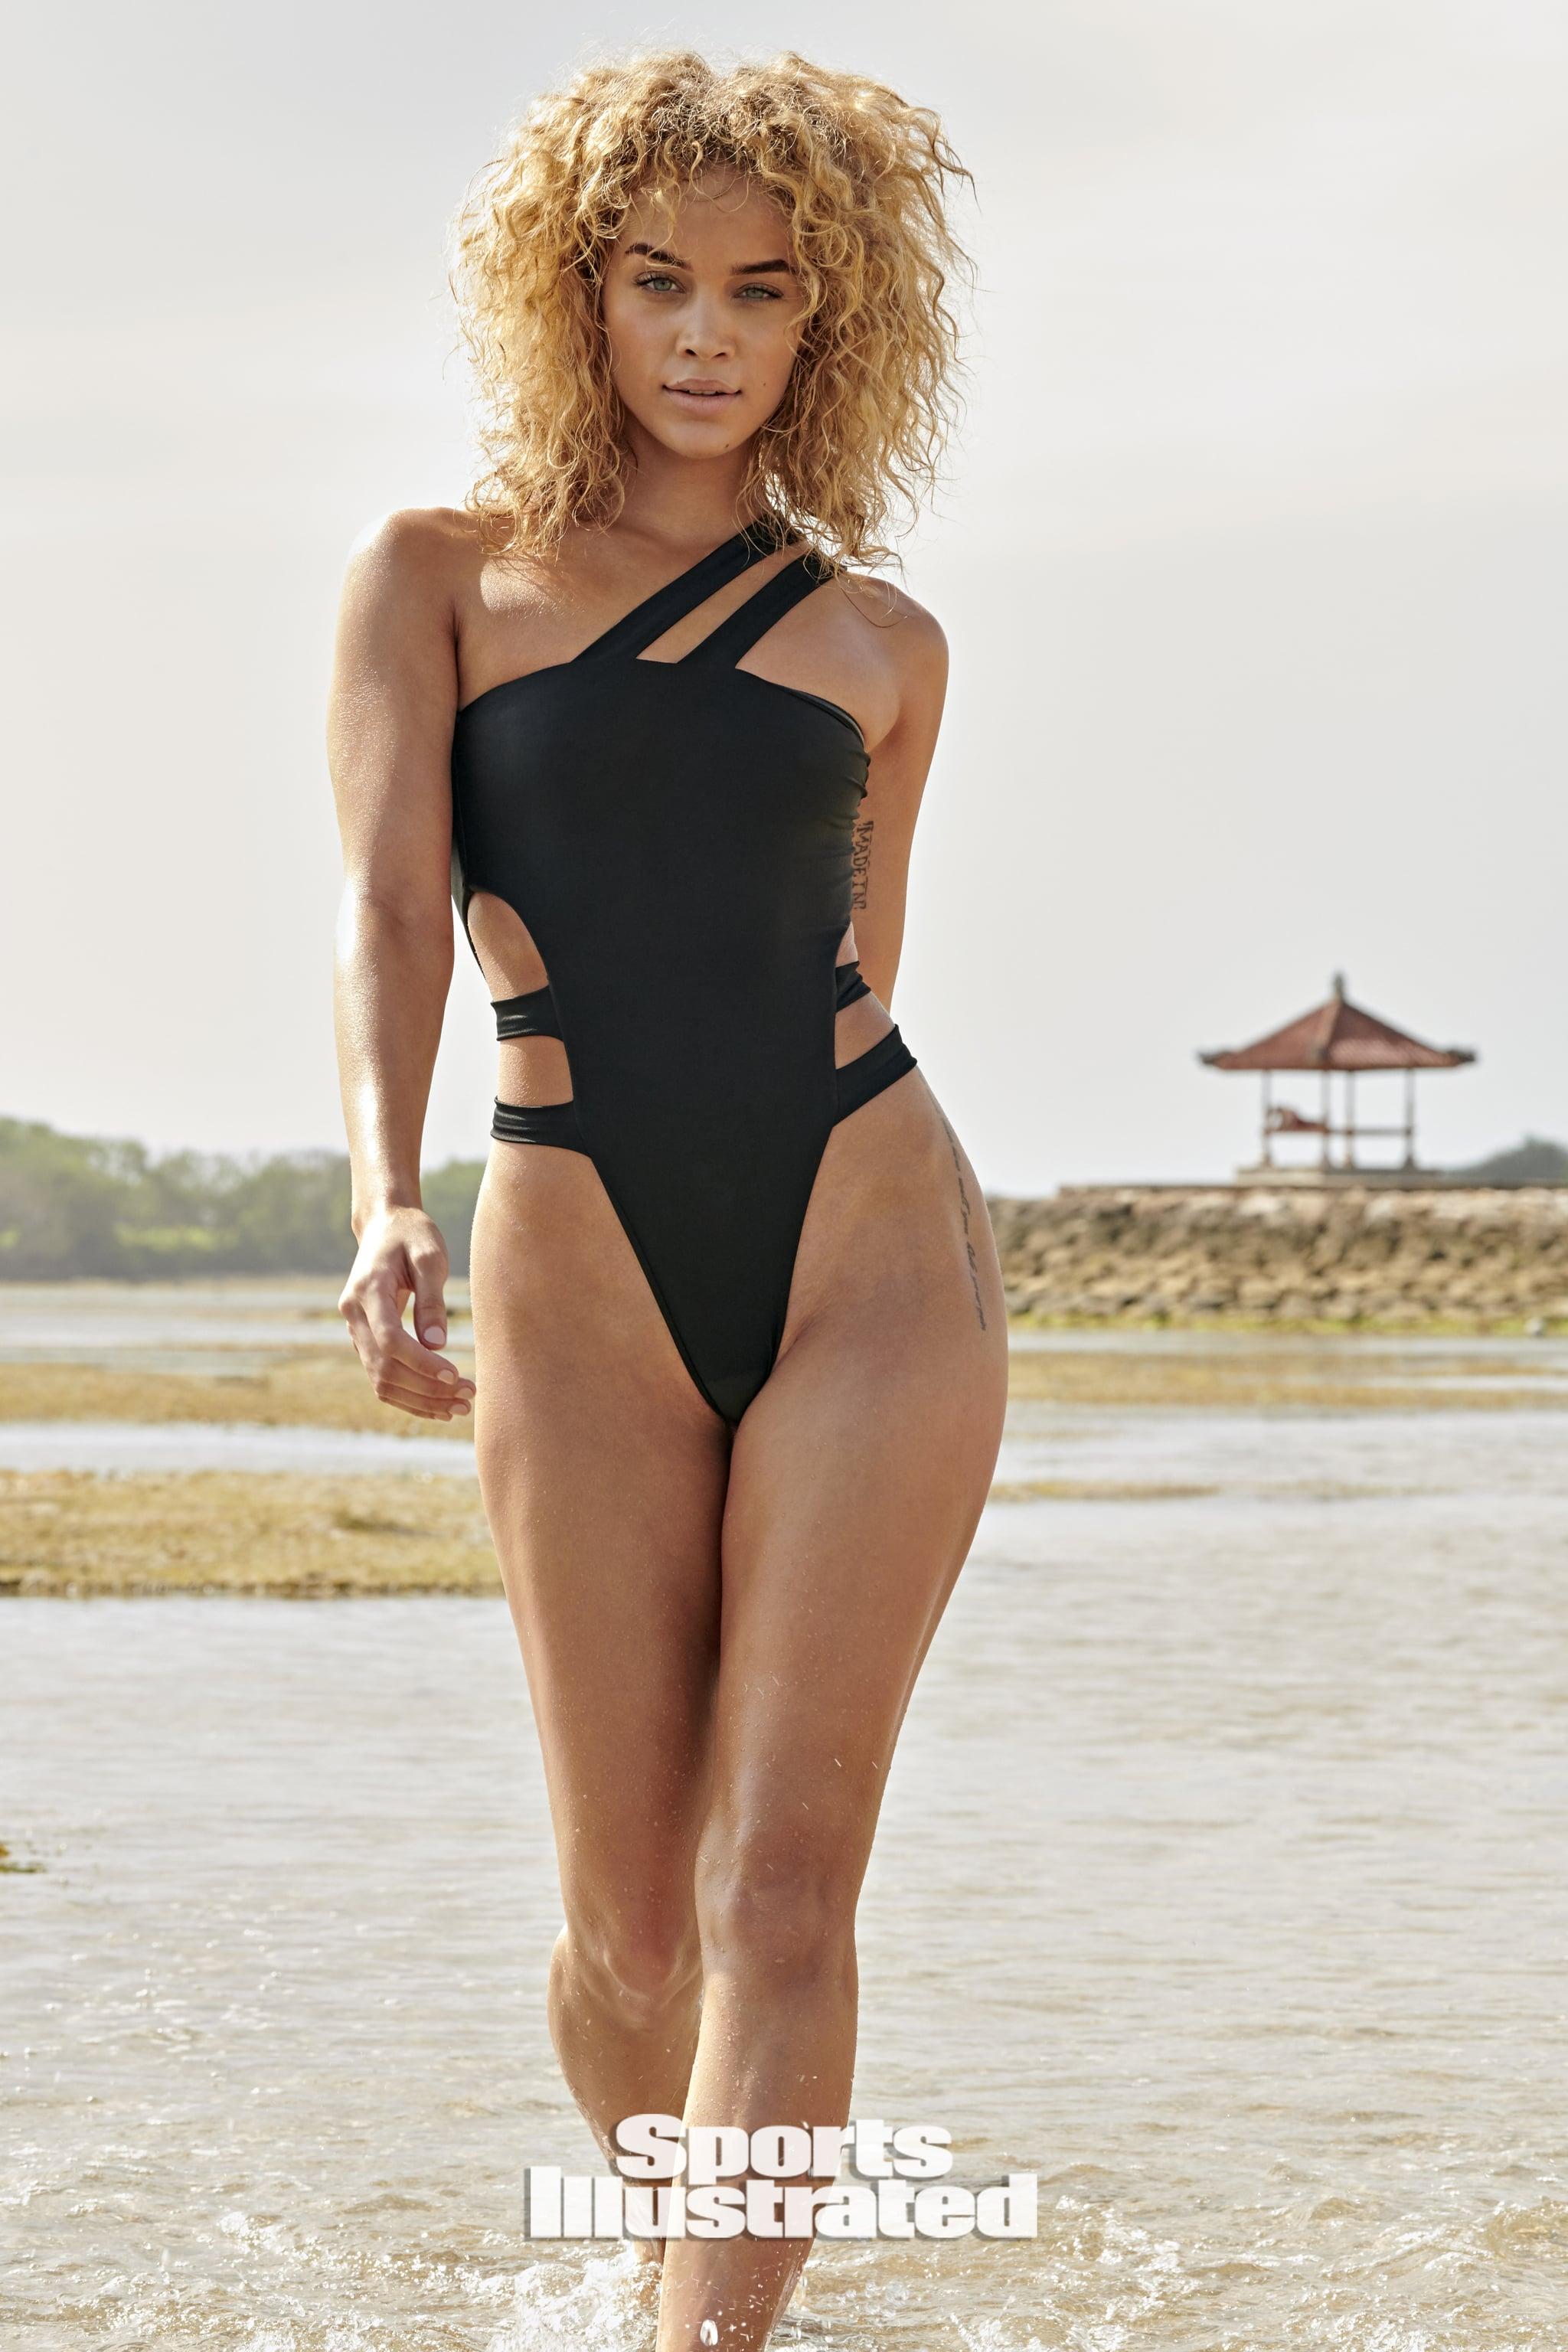 Jasmine Sanders On Sports Illustrated S Swimsuit Issue 2020 Popsugar Fashion